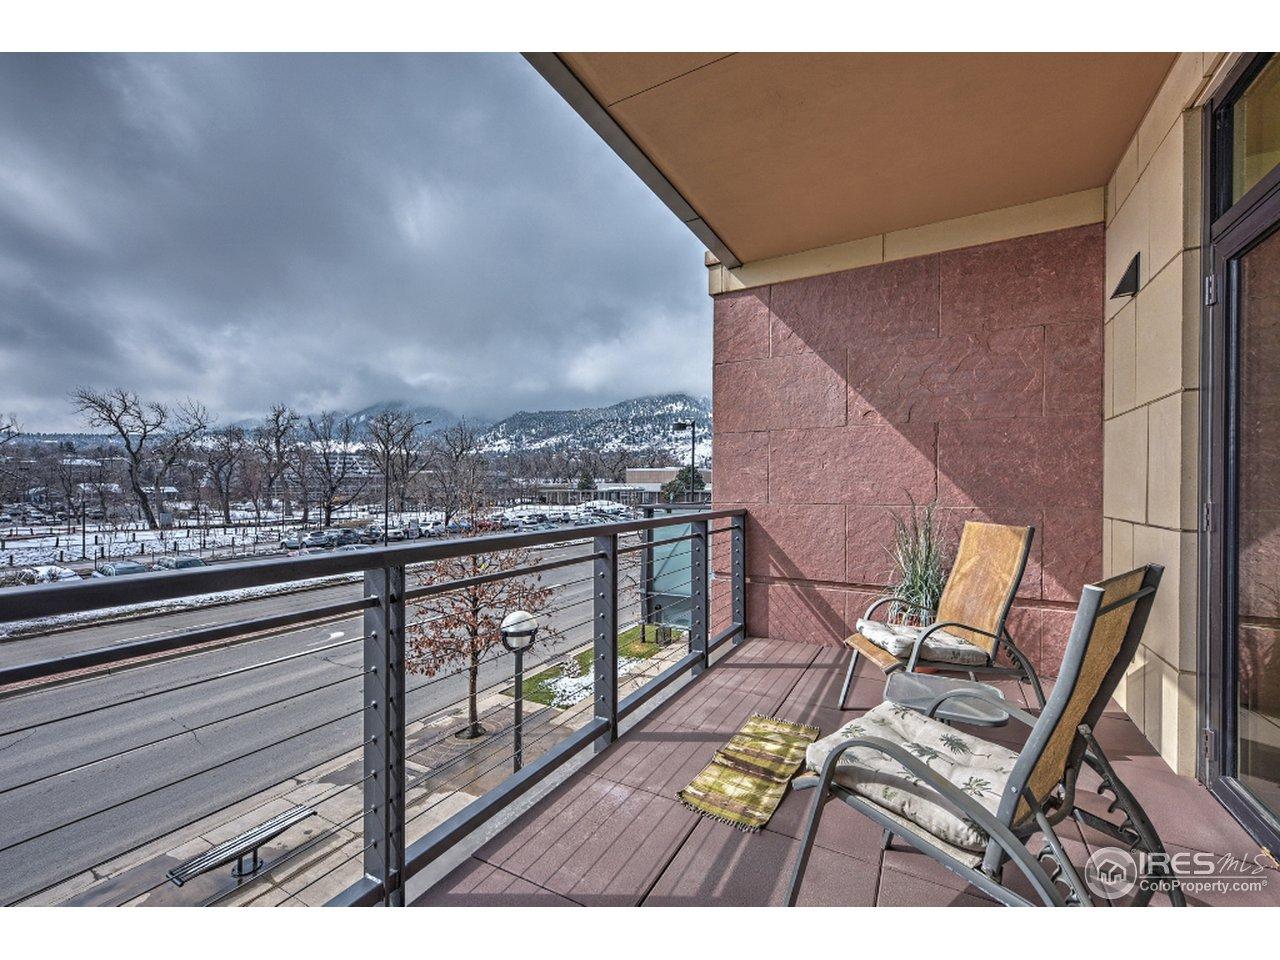 Balcony/deck